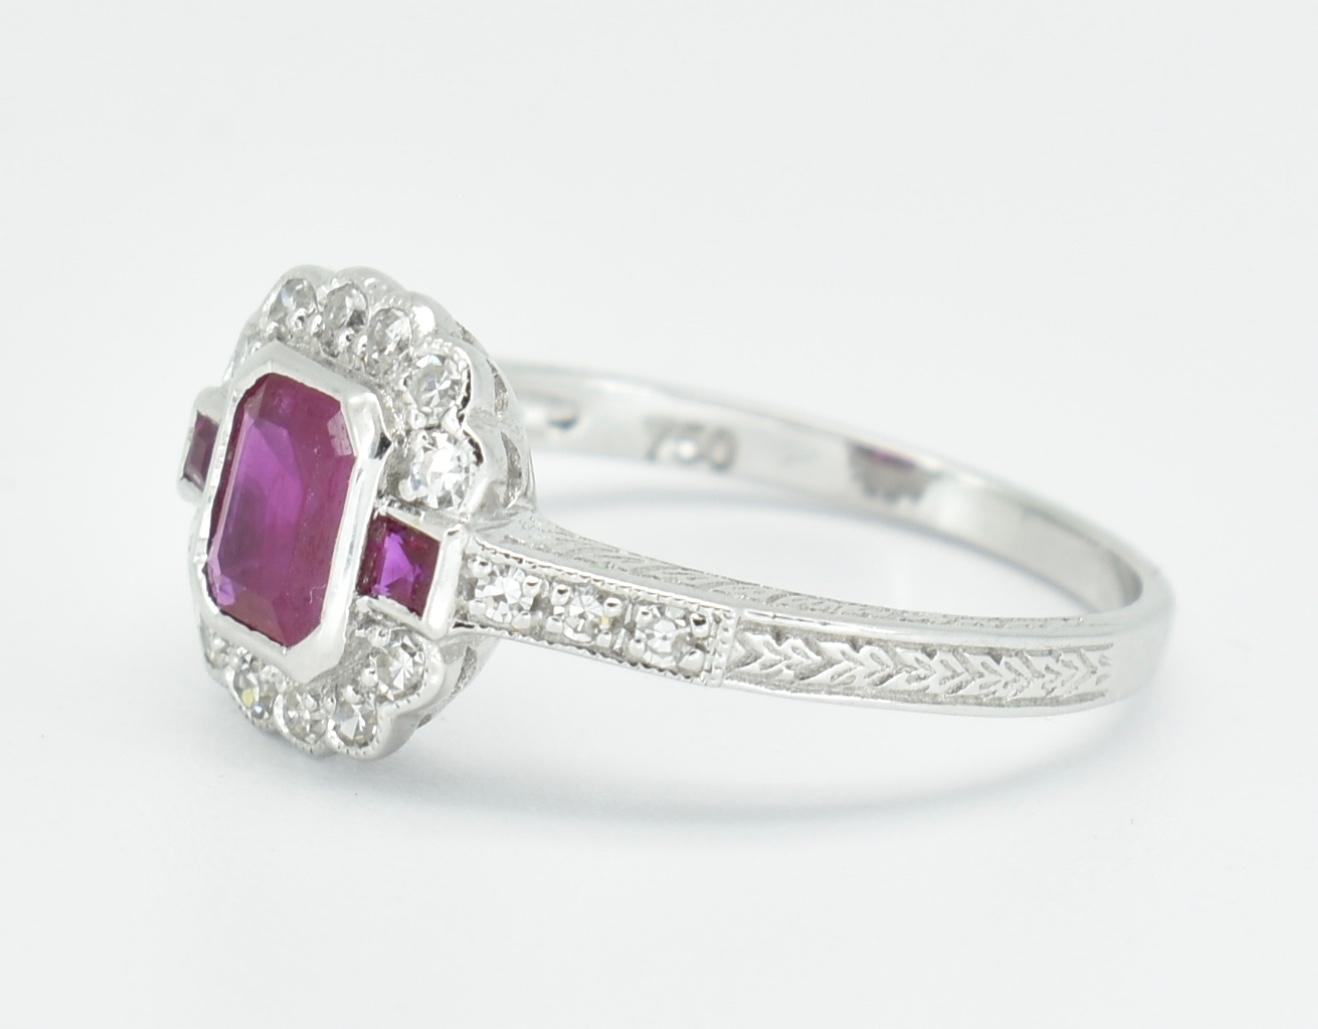 18CT WHITE GOLD RUBY & DIAMOND RING - Image 5 of 5